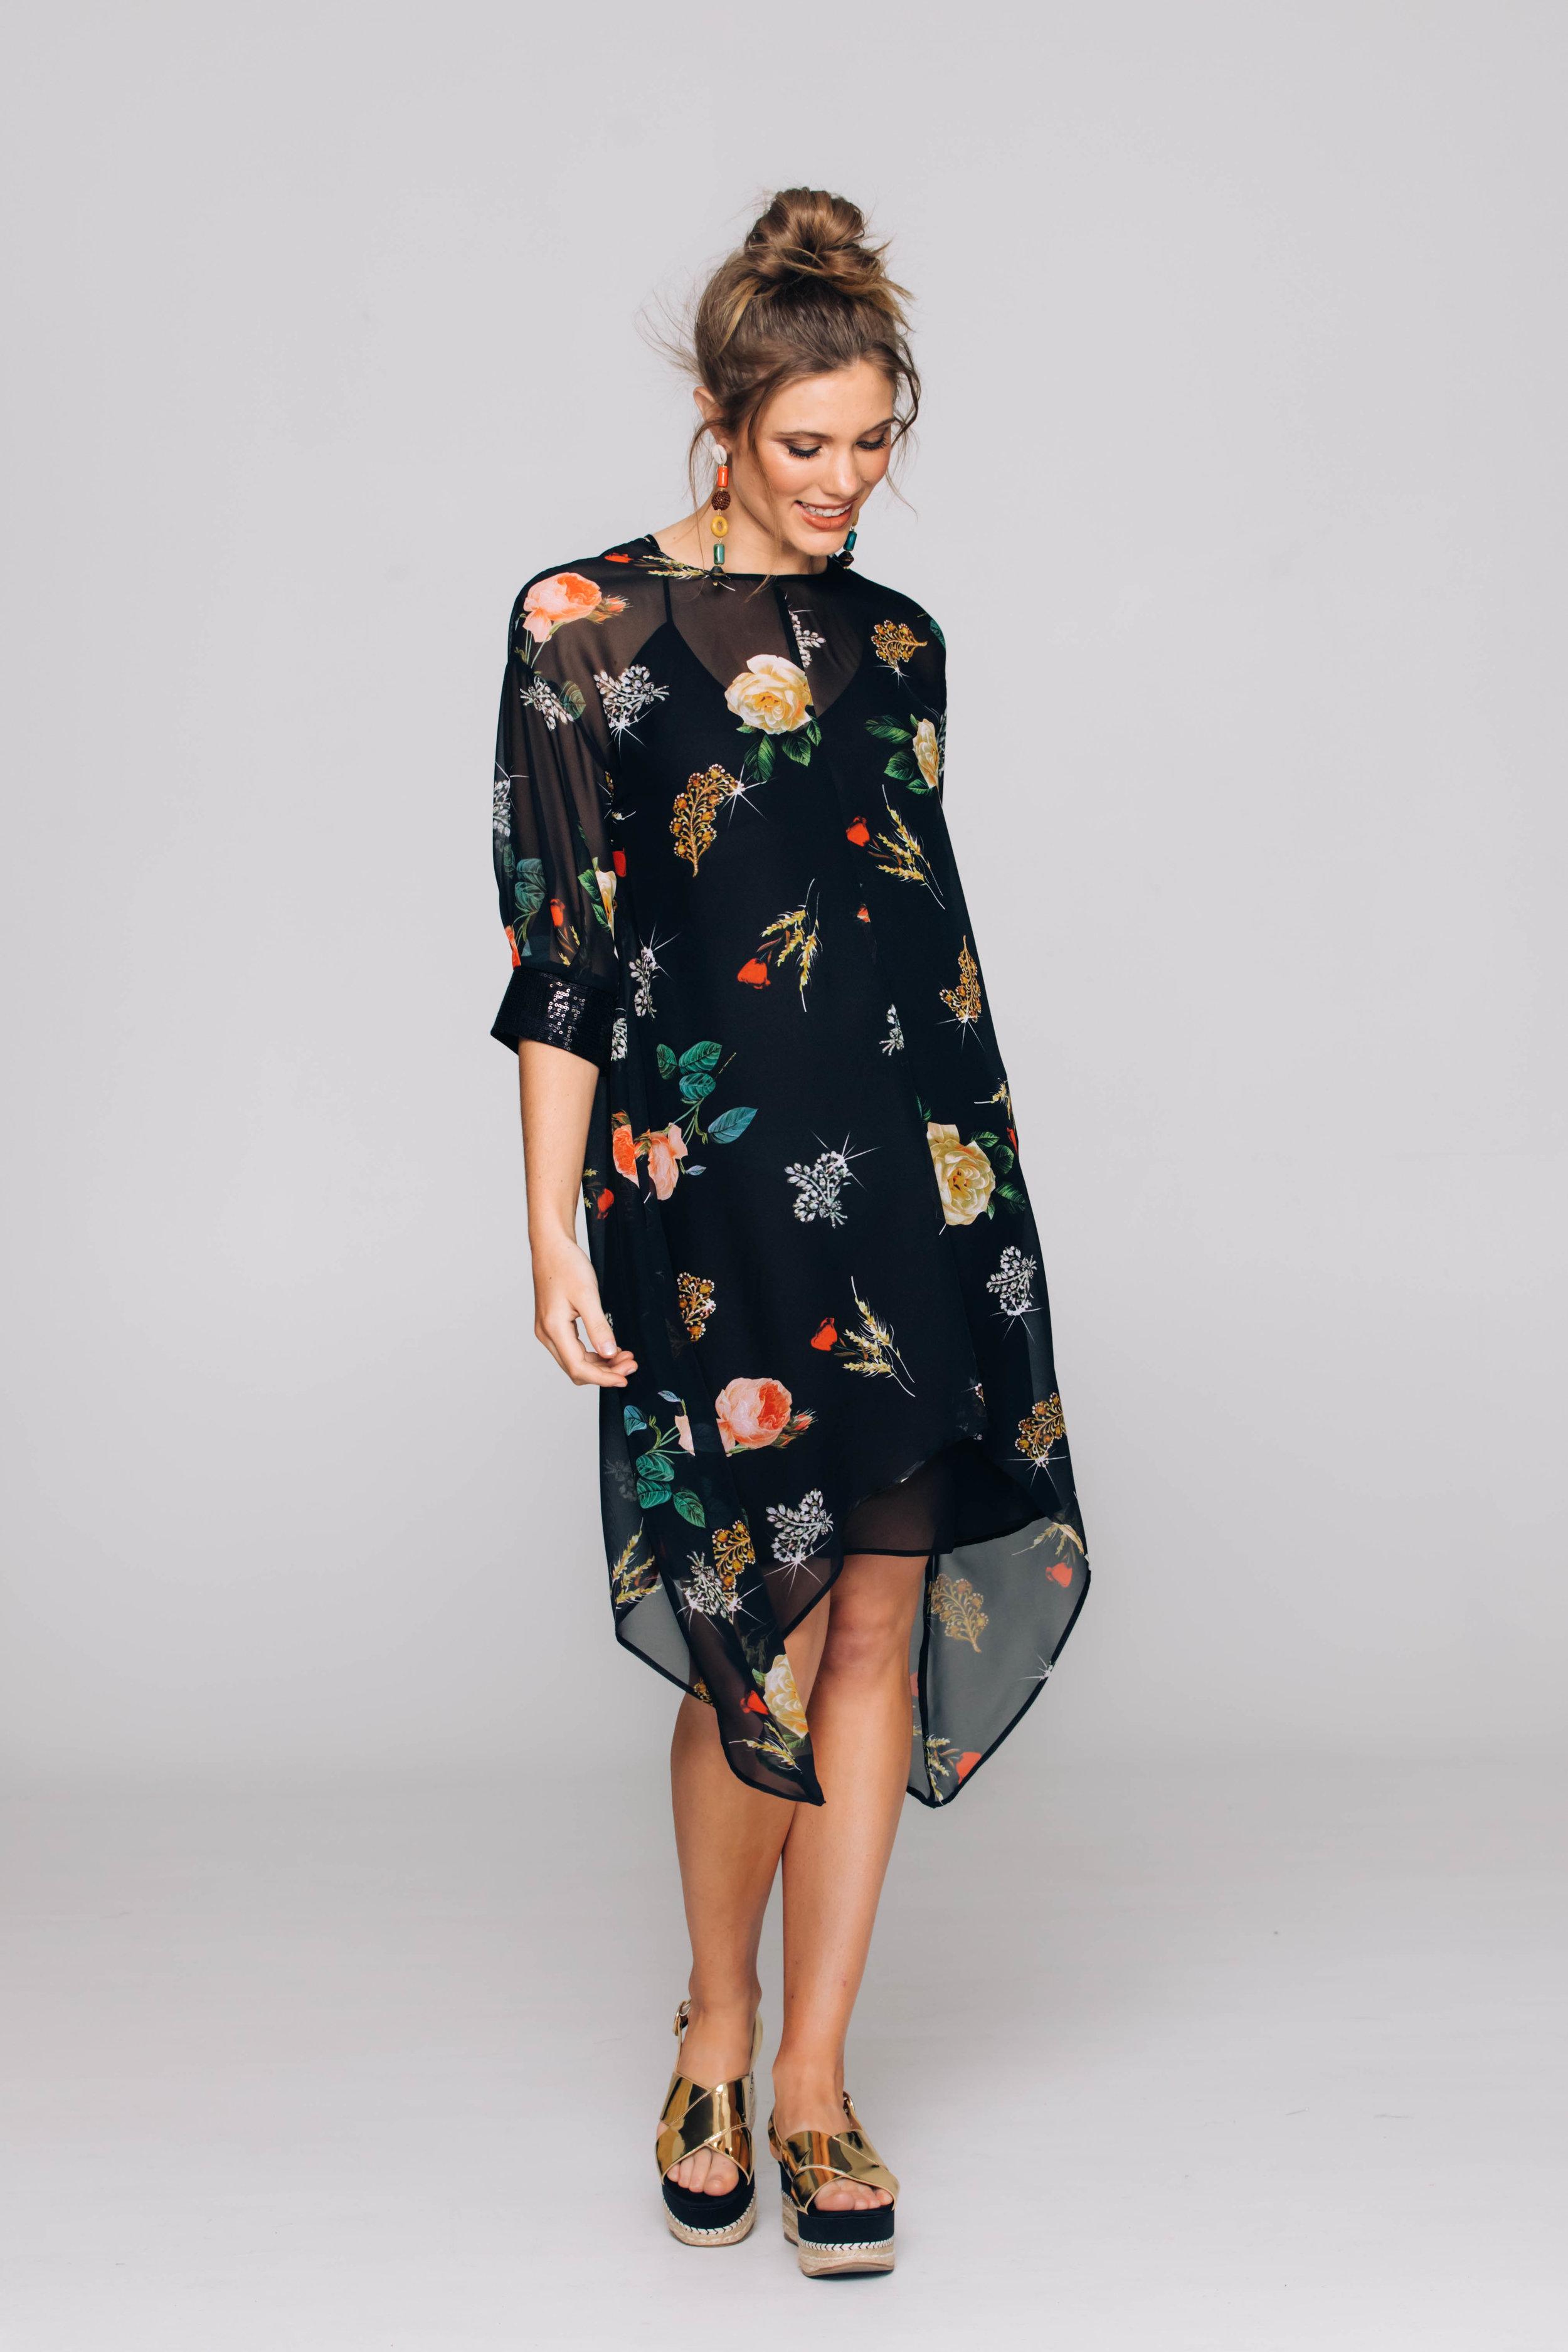 6249T Lawrence Dress